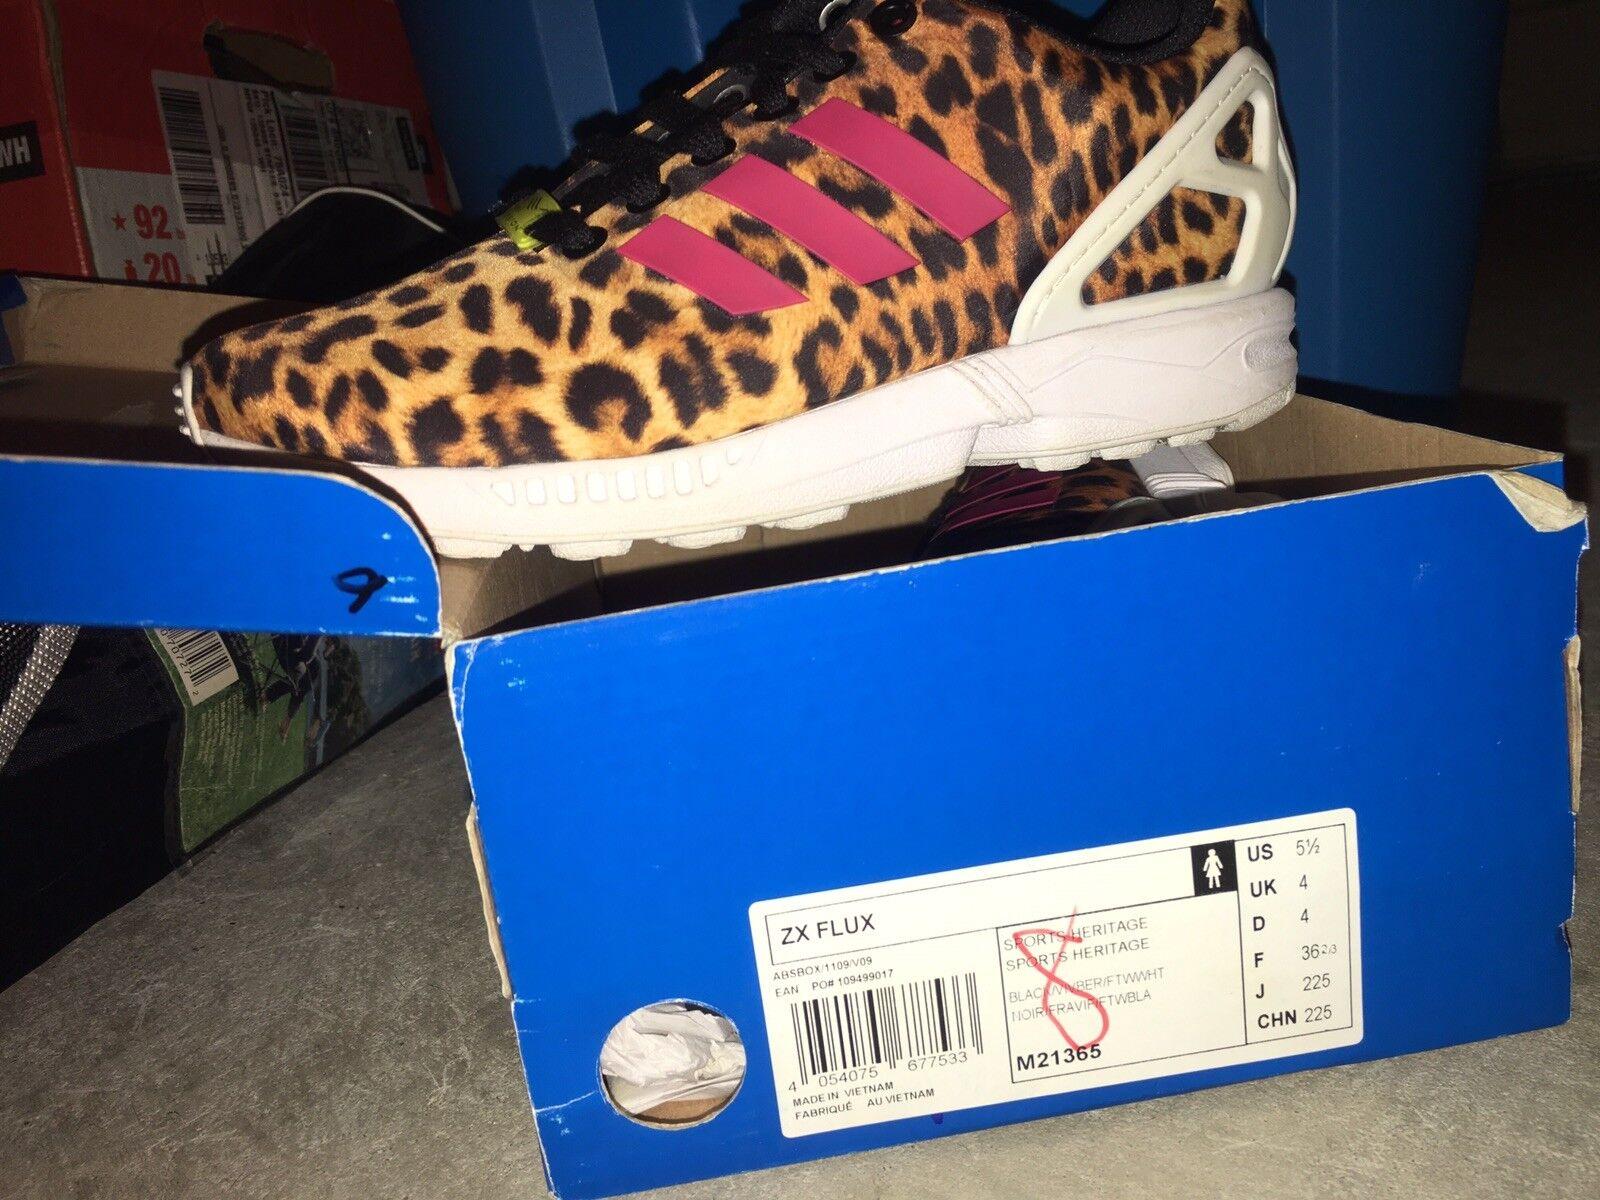 adidas zx flux Cheetah women's shoe Nike air Jordan Retro Yeezy bape Supreme lot Brand discount